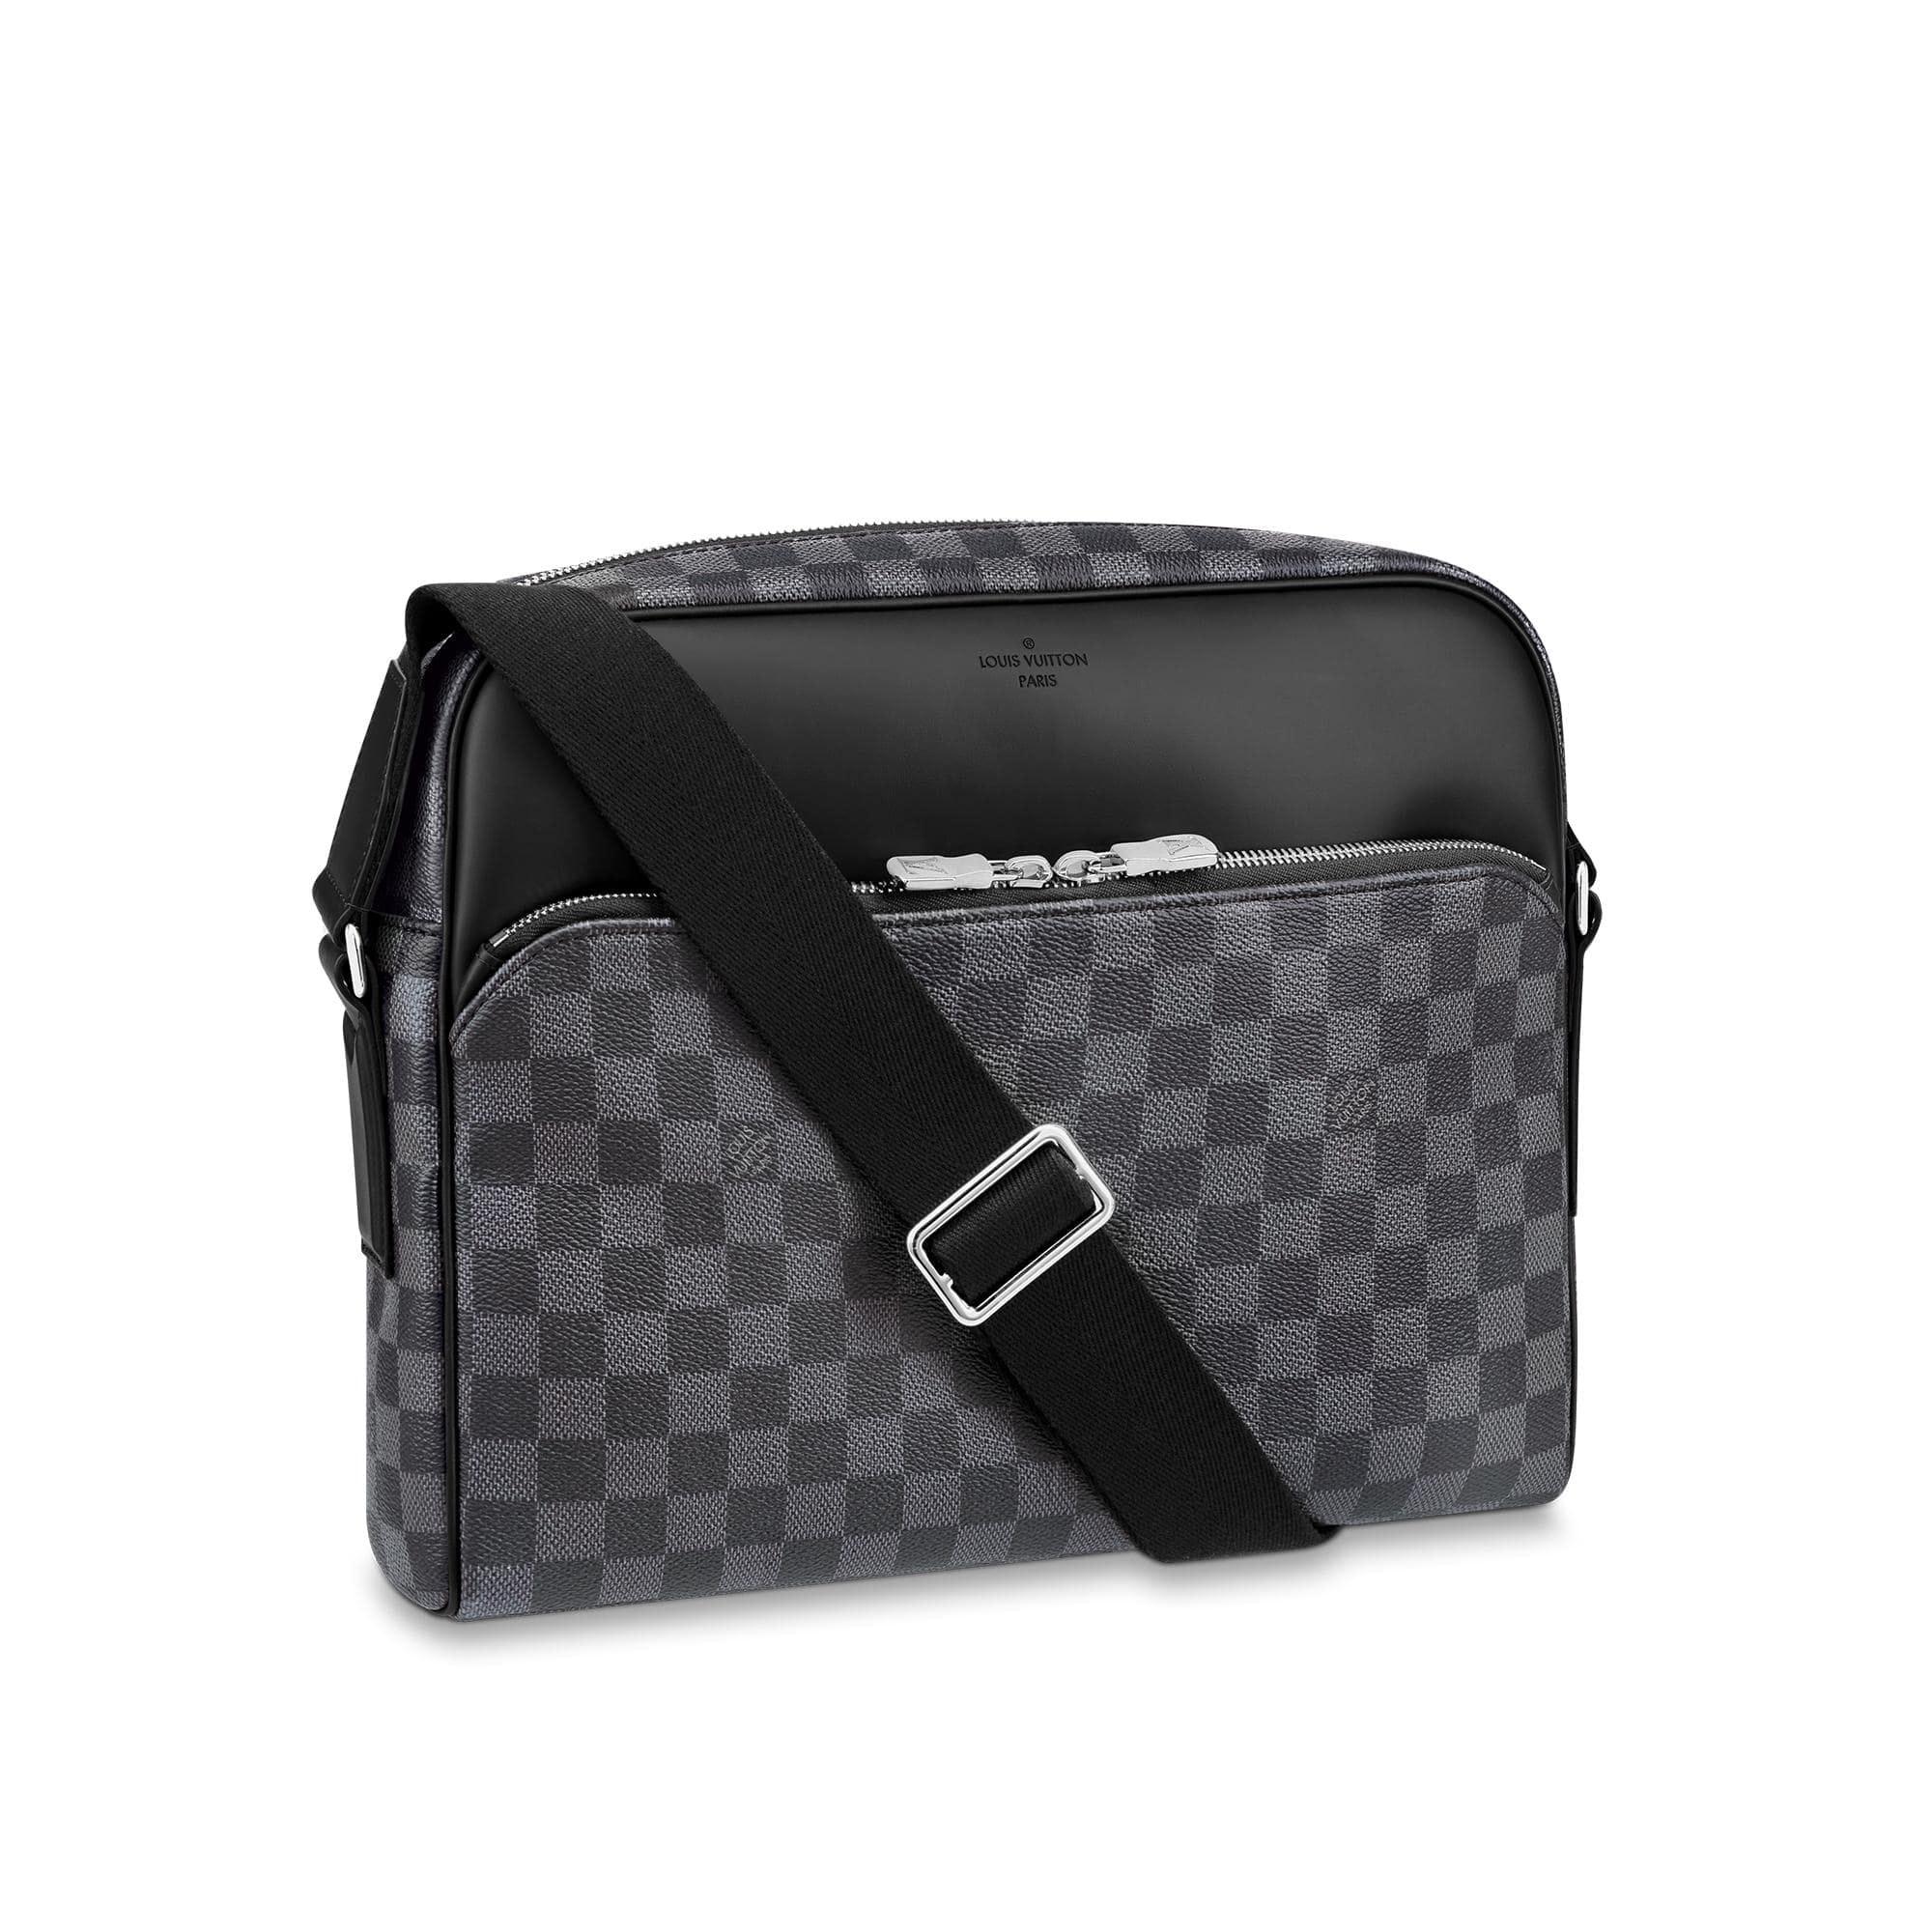 Louis Vuitton Reporter Dayton Damier Graphite MM Black/Grey